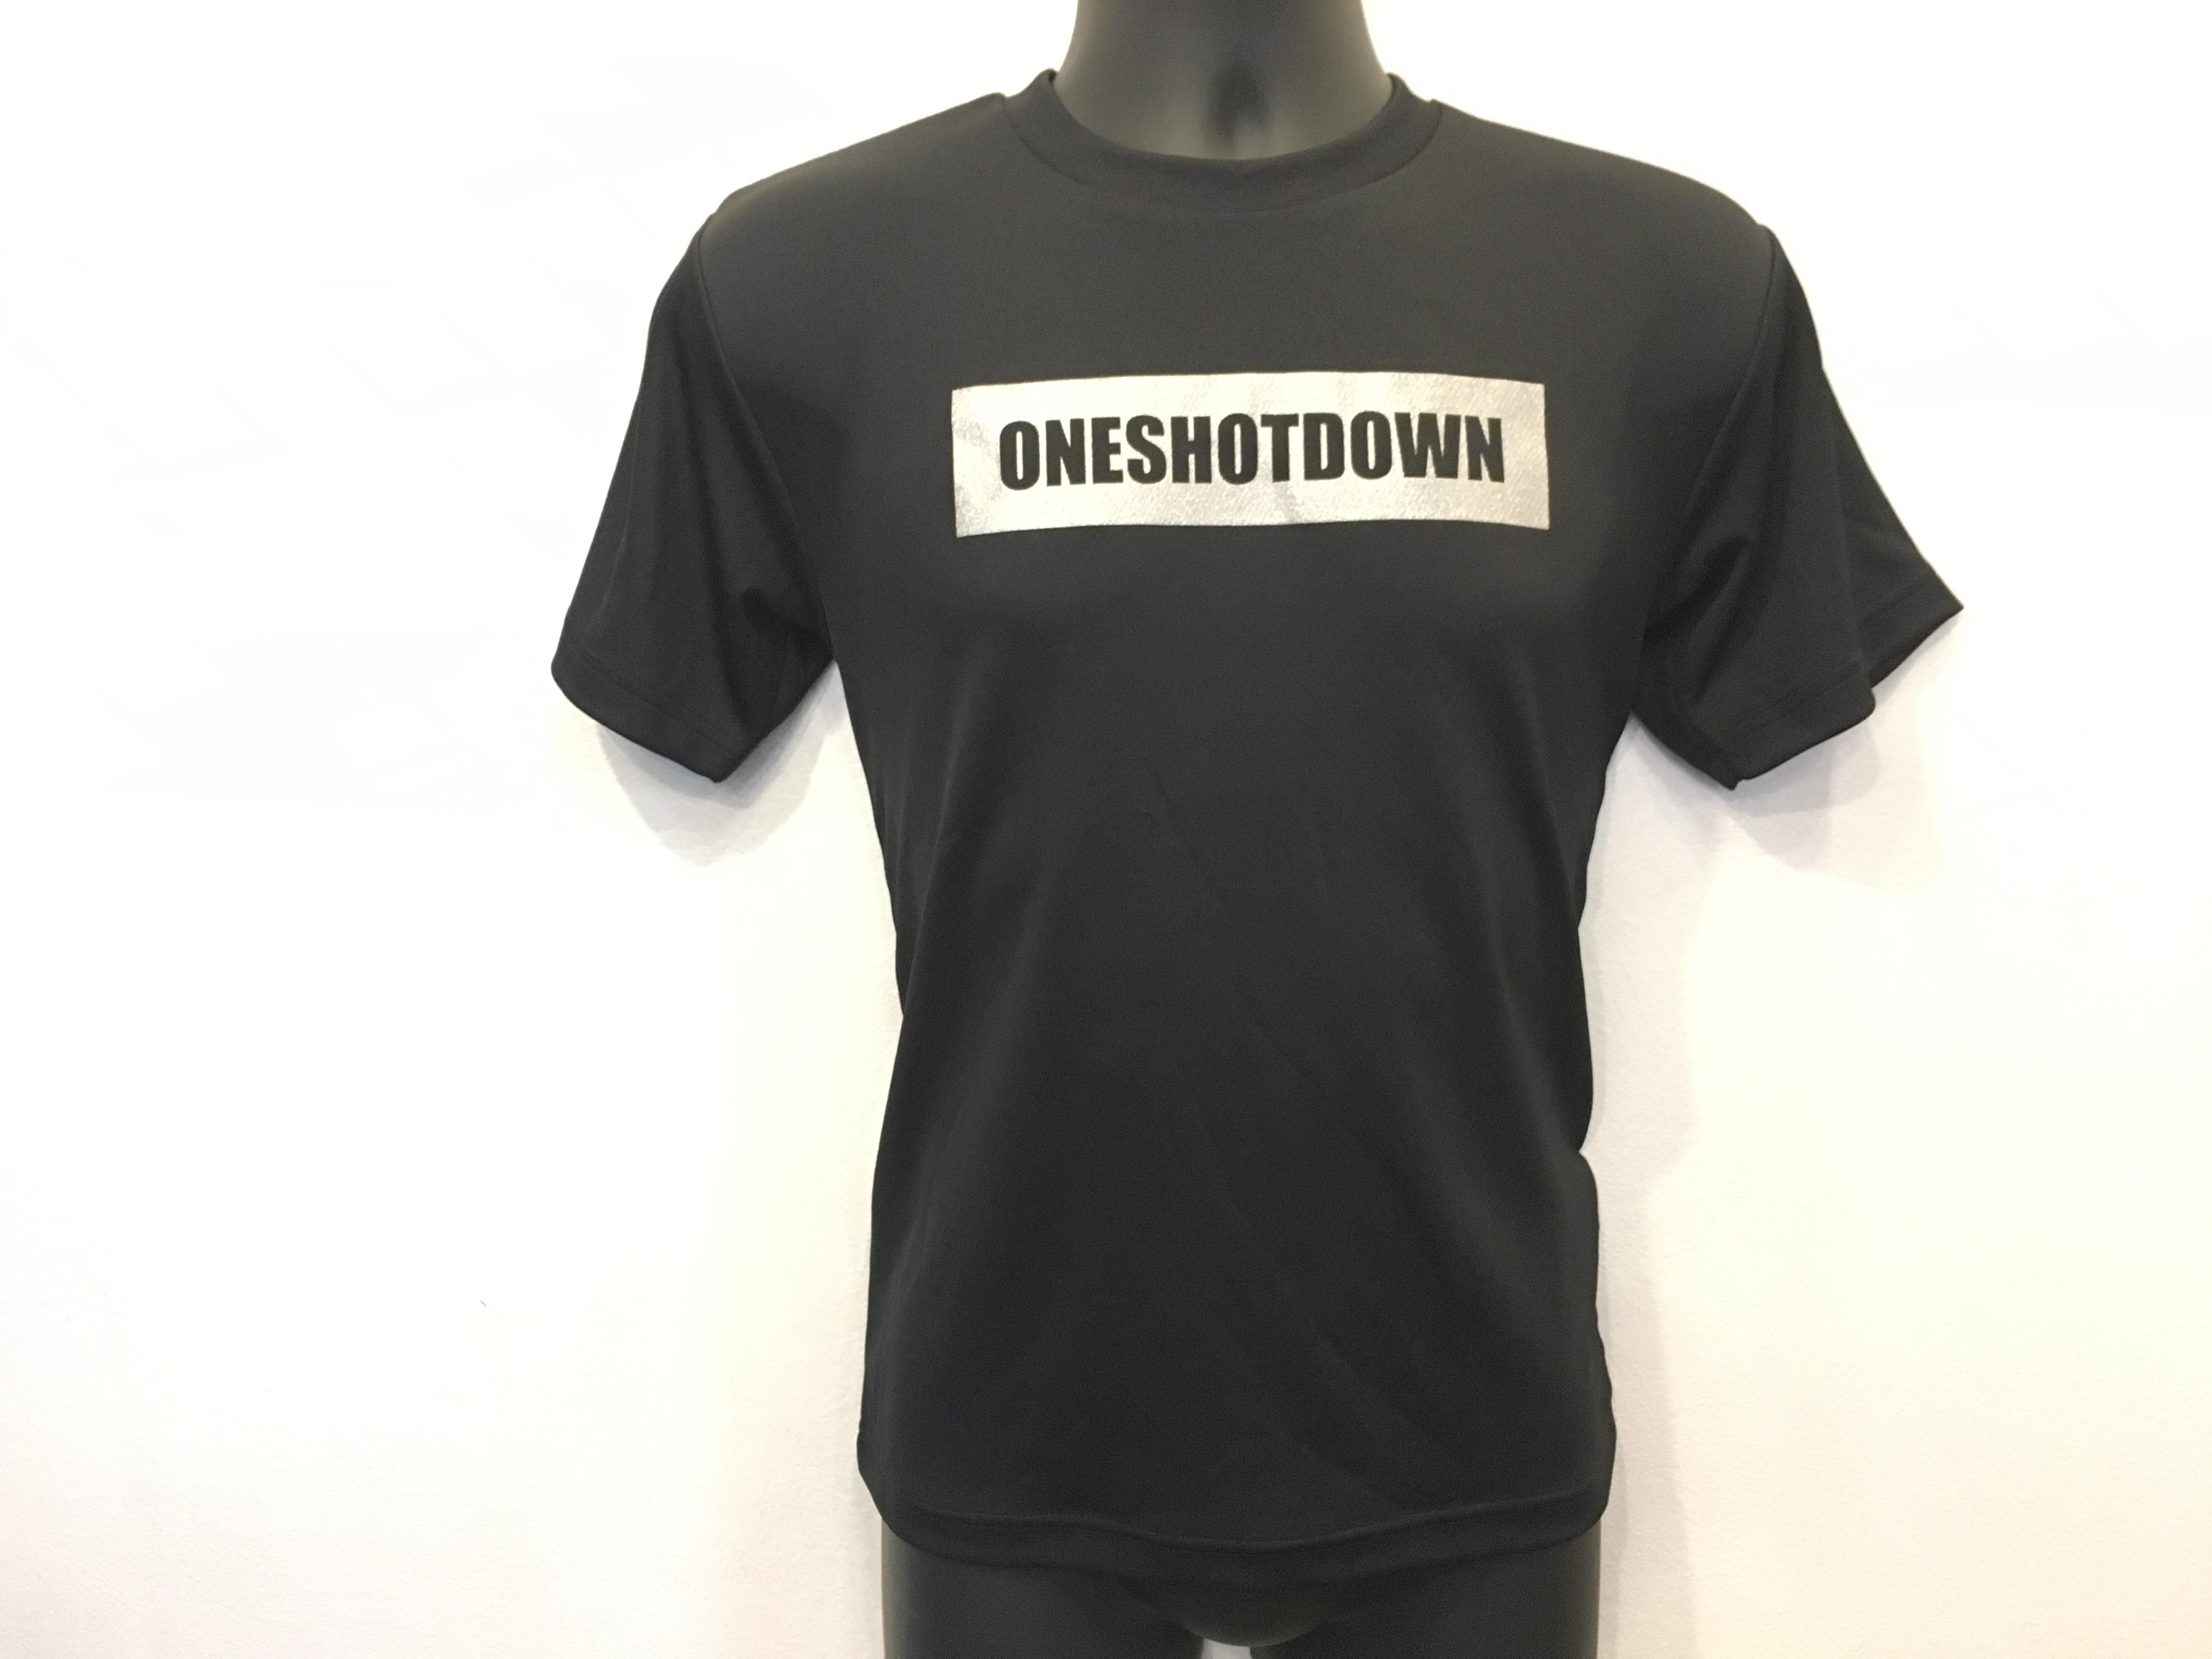 ONESHOTDOWN ボックスロゴ ドライTシャツ - 画像3